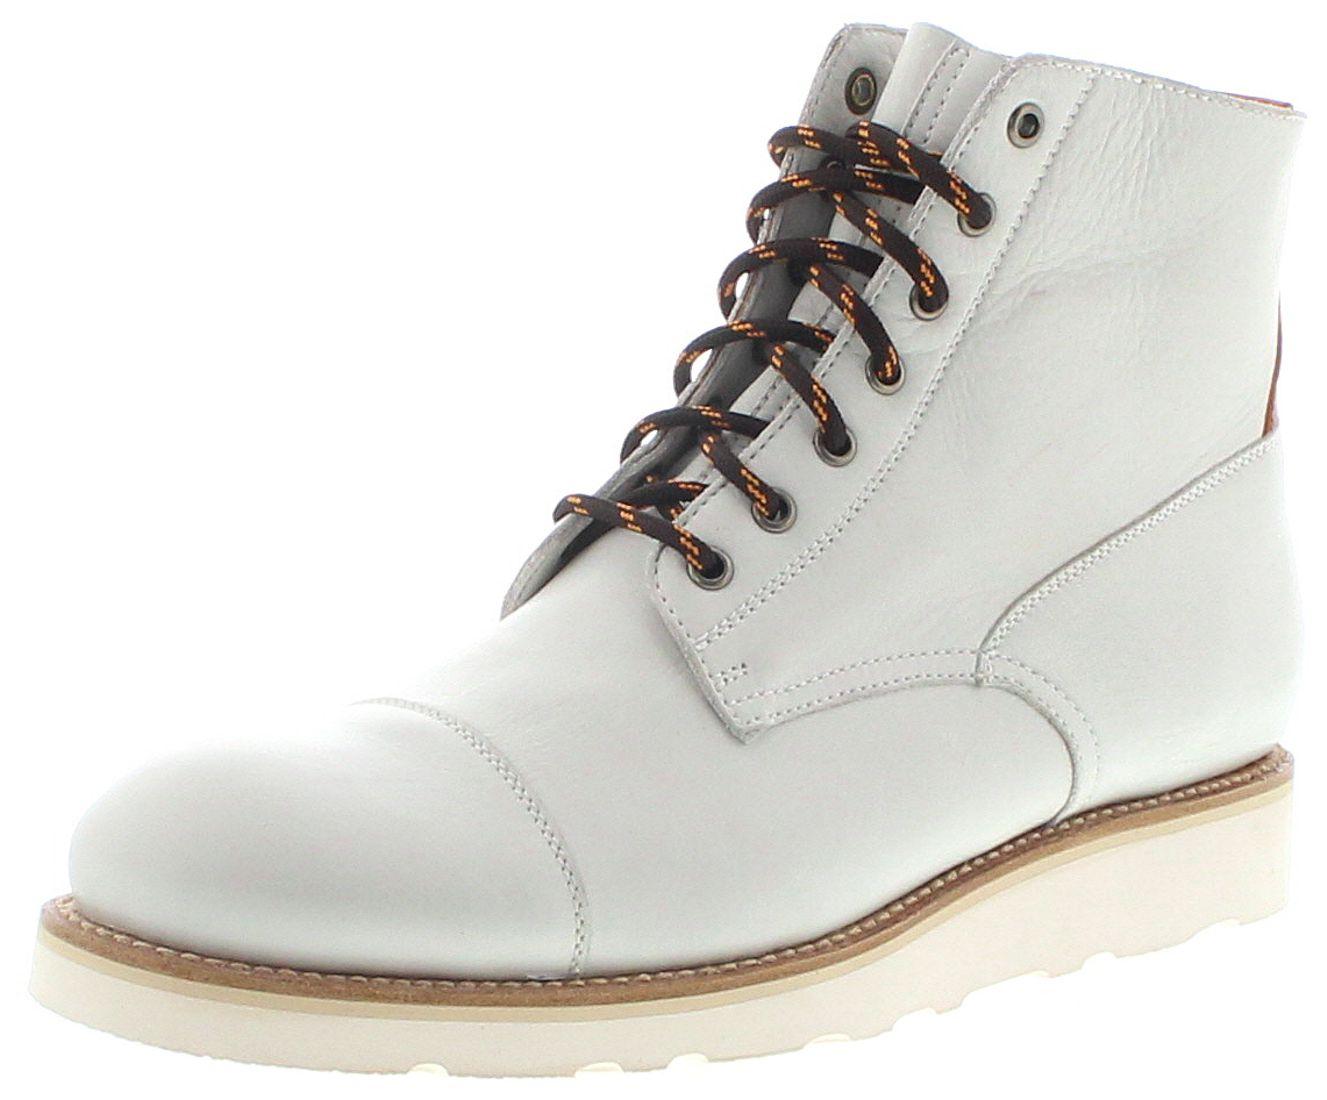 Sendra Boots 16401 Avorio Herren Schnürschuhe - grau